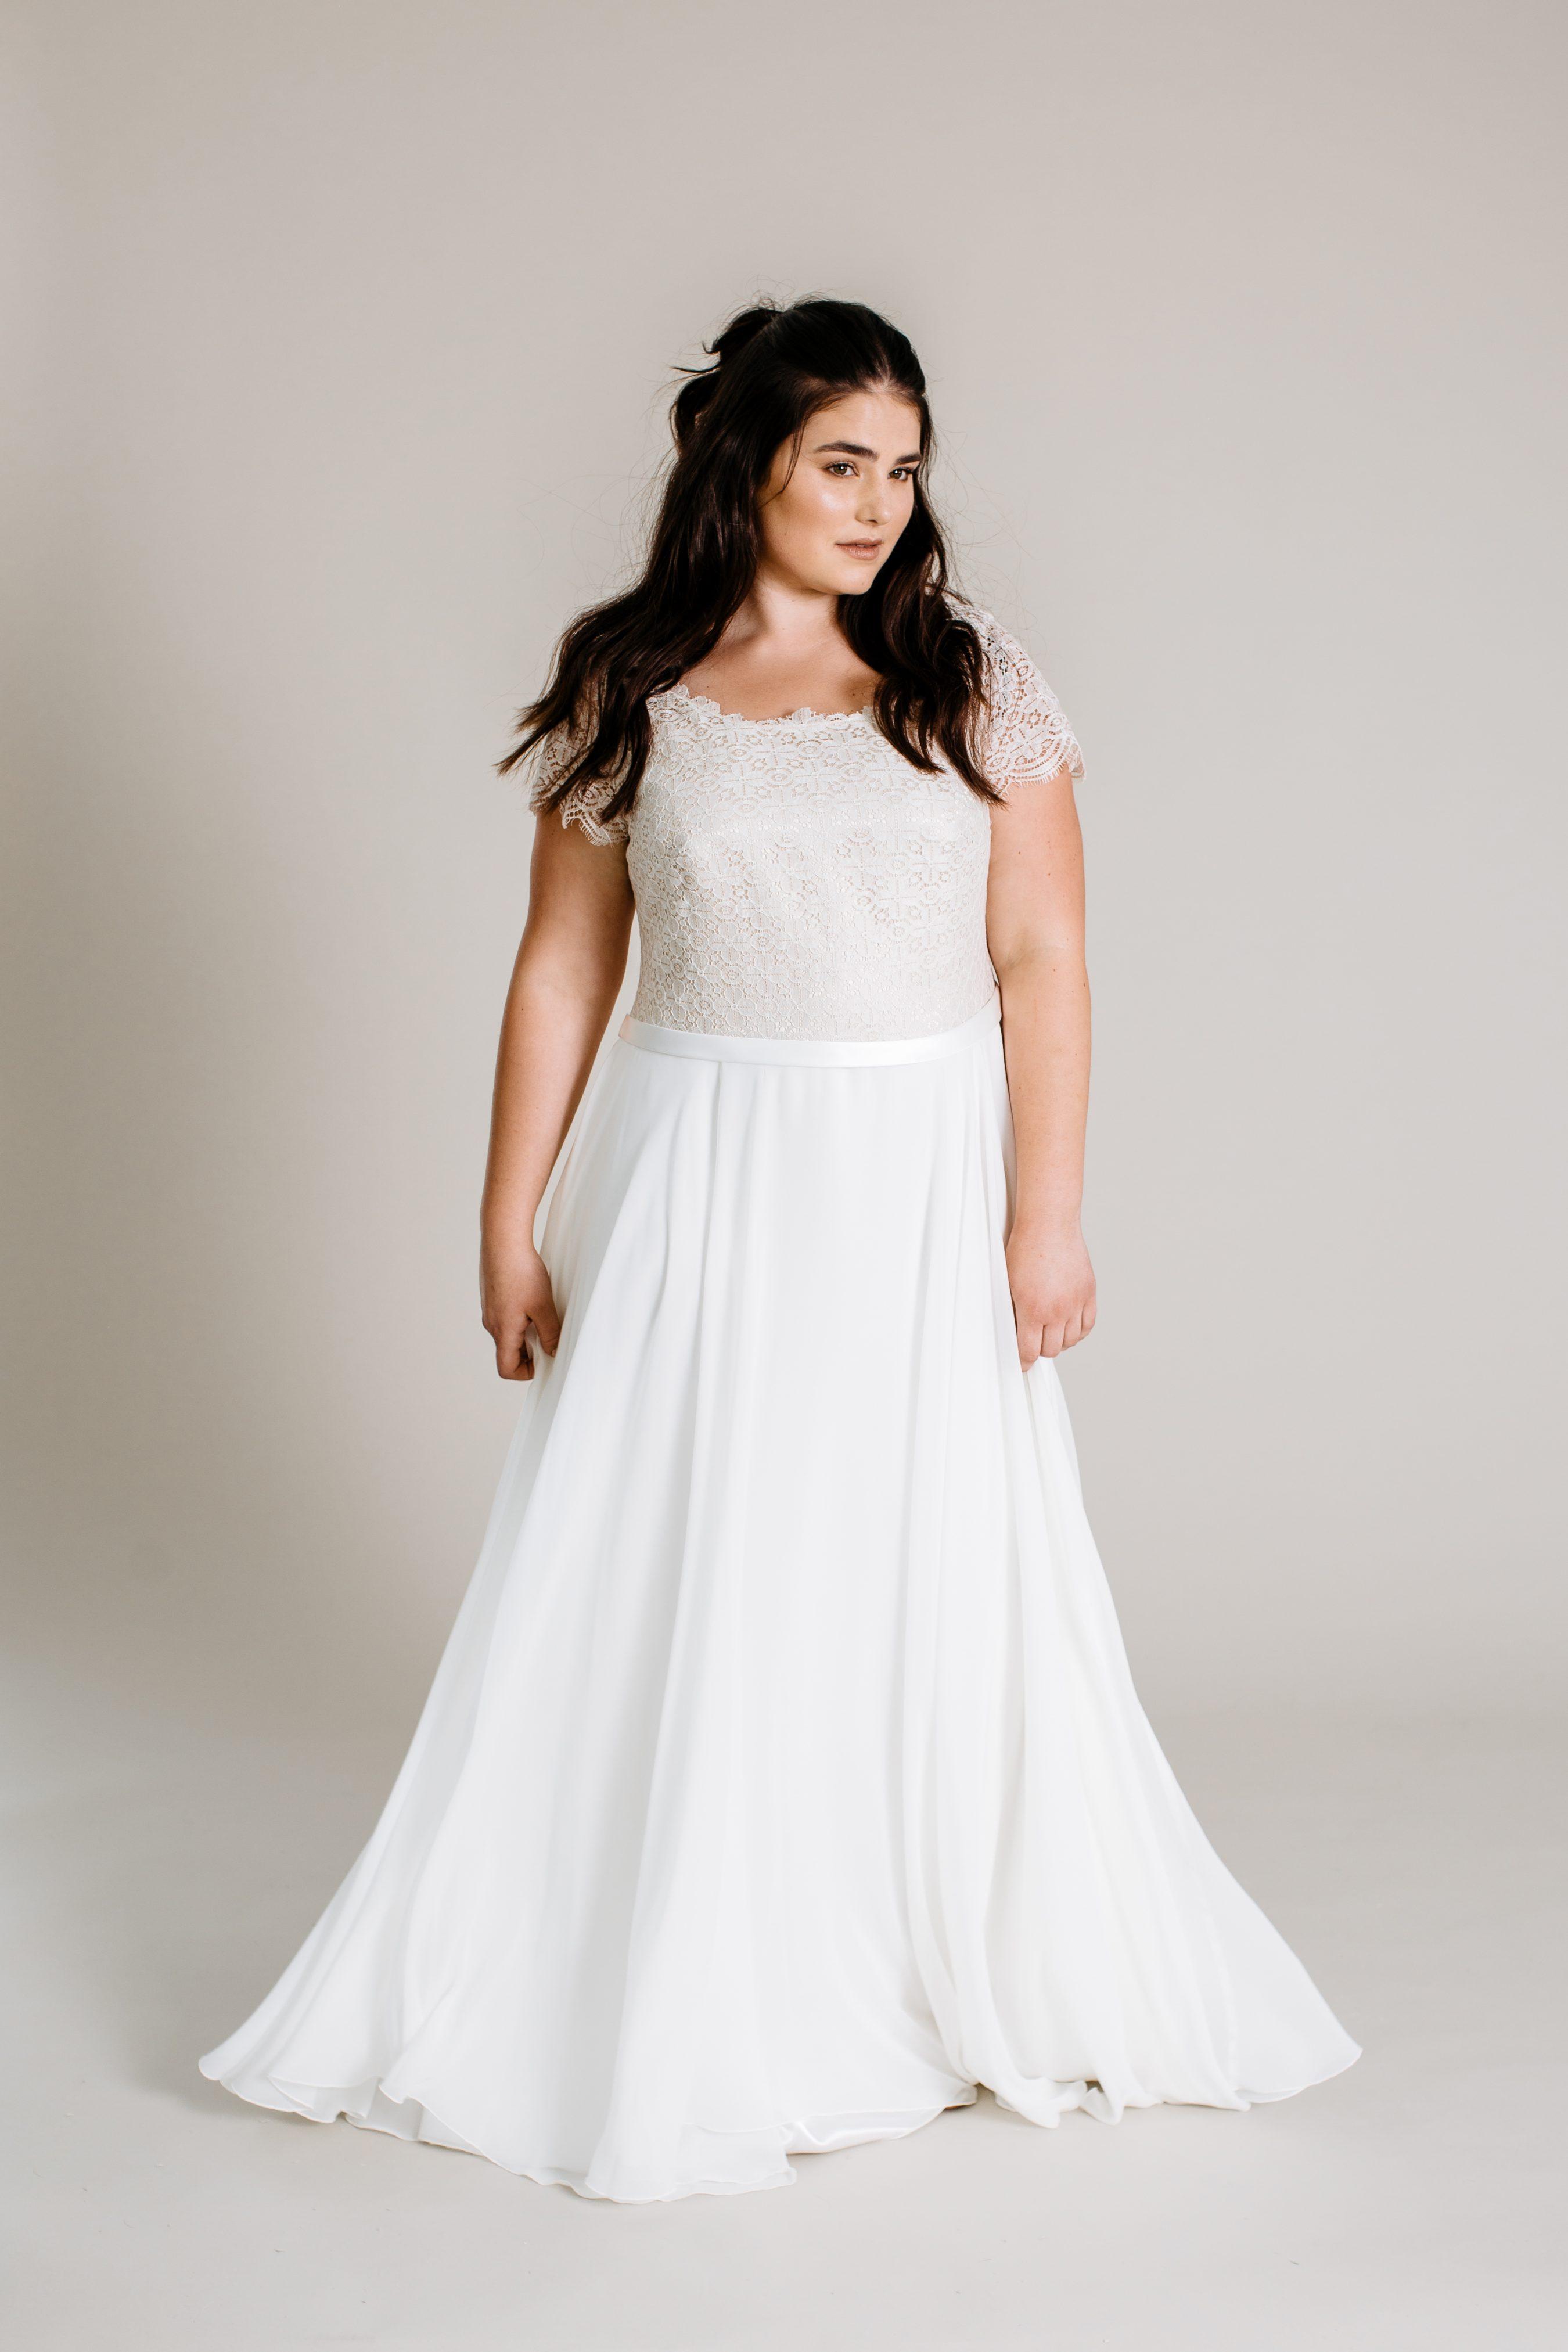 Brautkleid ab Größe 44